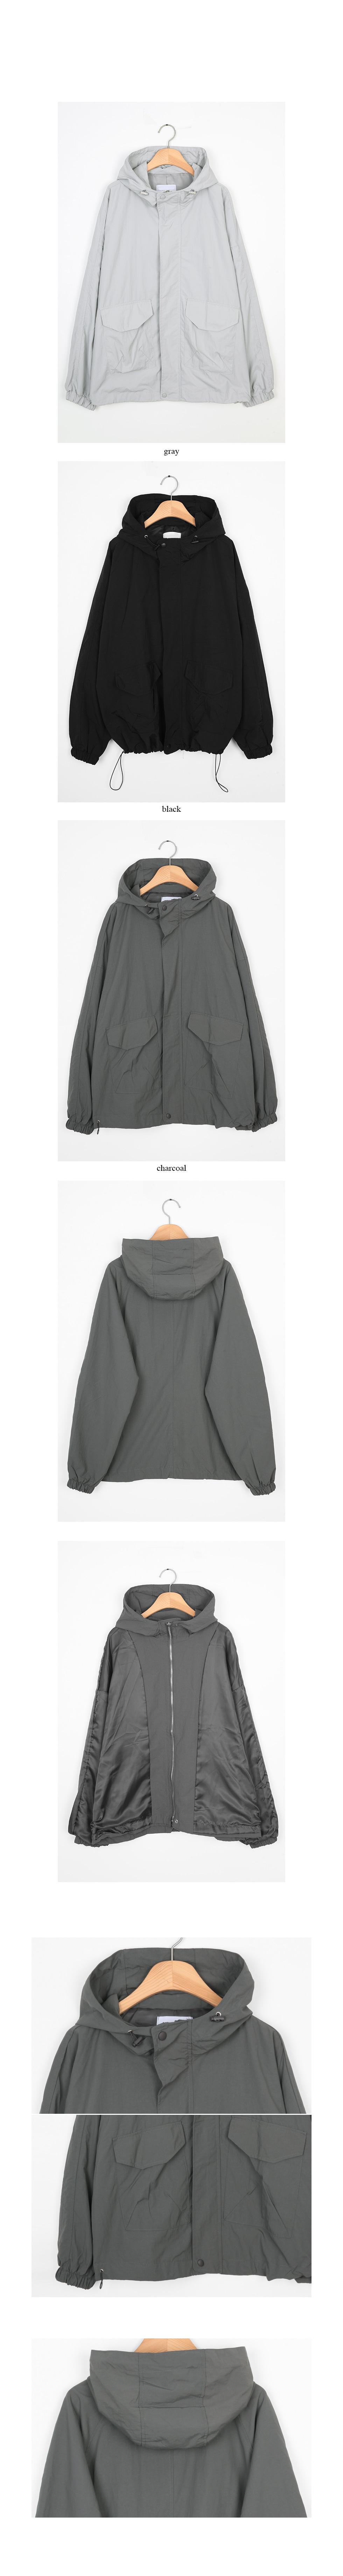 faintly texture hoody jumper